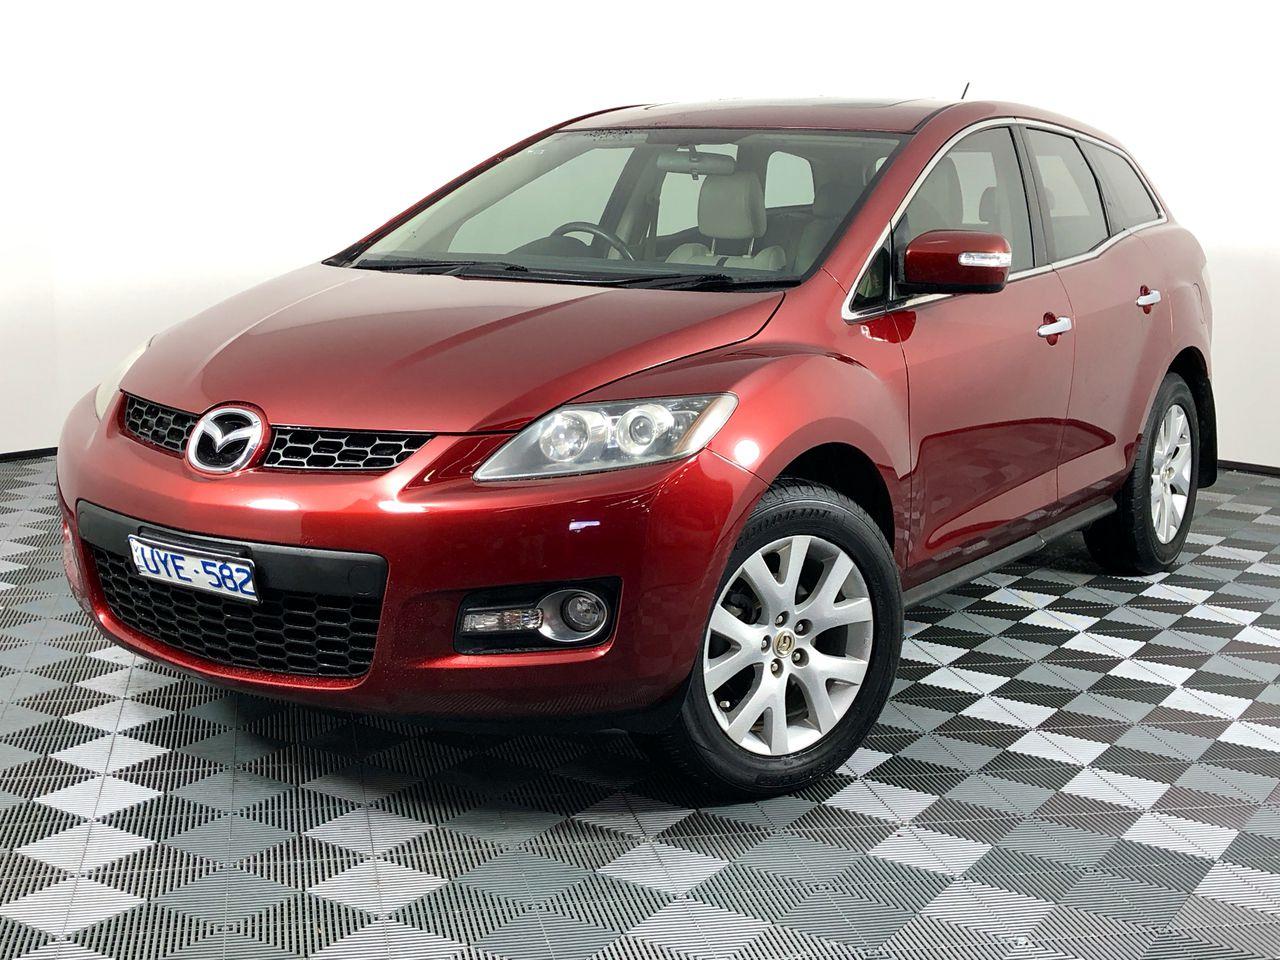 2007 Mazda CX-7 Luxury (4x4) Automatic (RWC issued 24/05/2019)